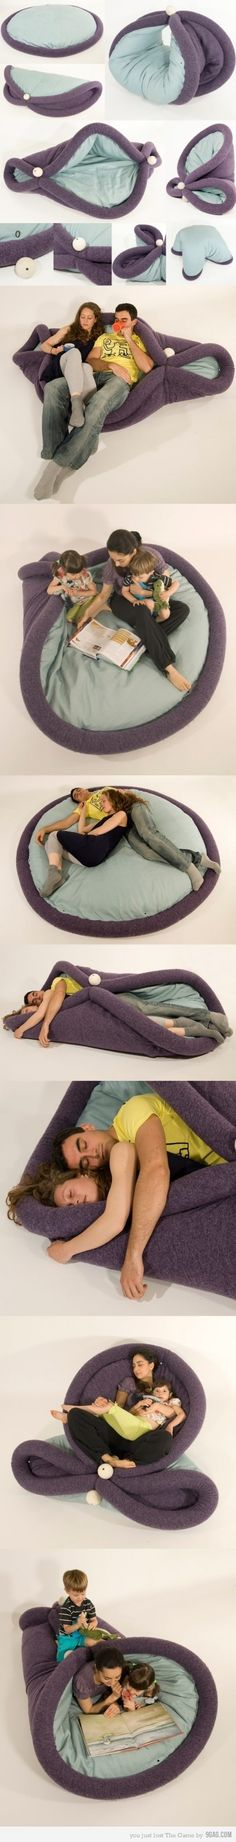 Original Carpet Pillow